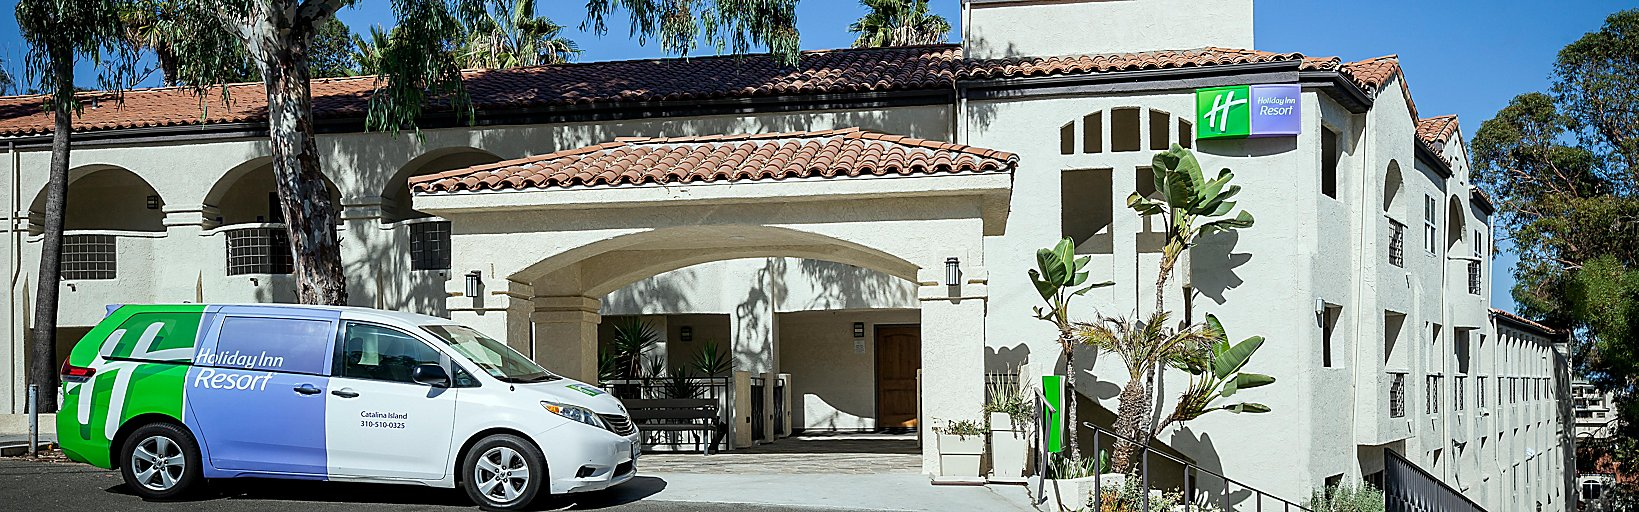 Holiday Inn Resort Catalina Island Hotel by IHG